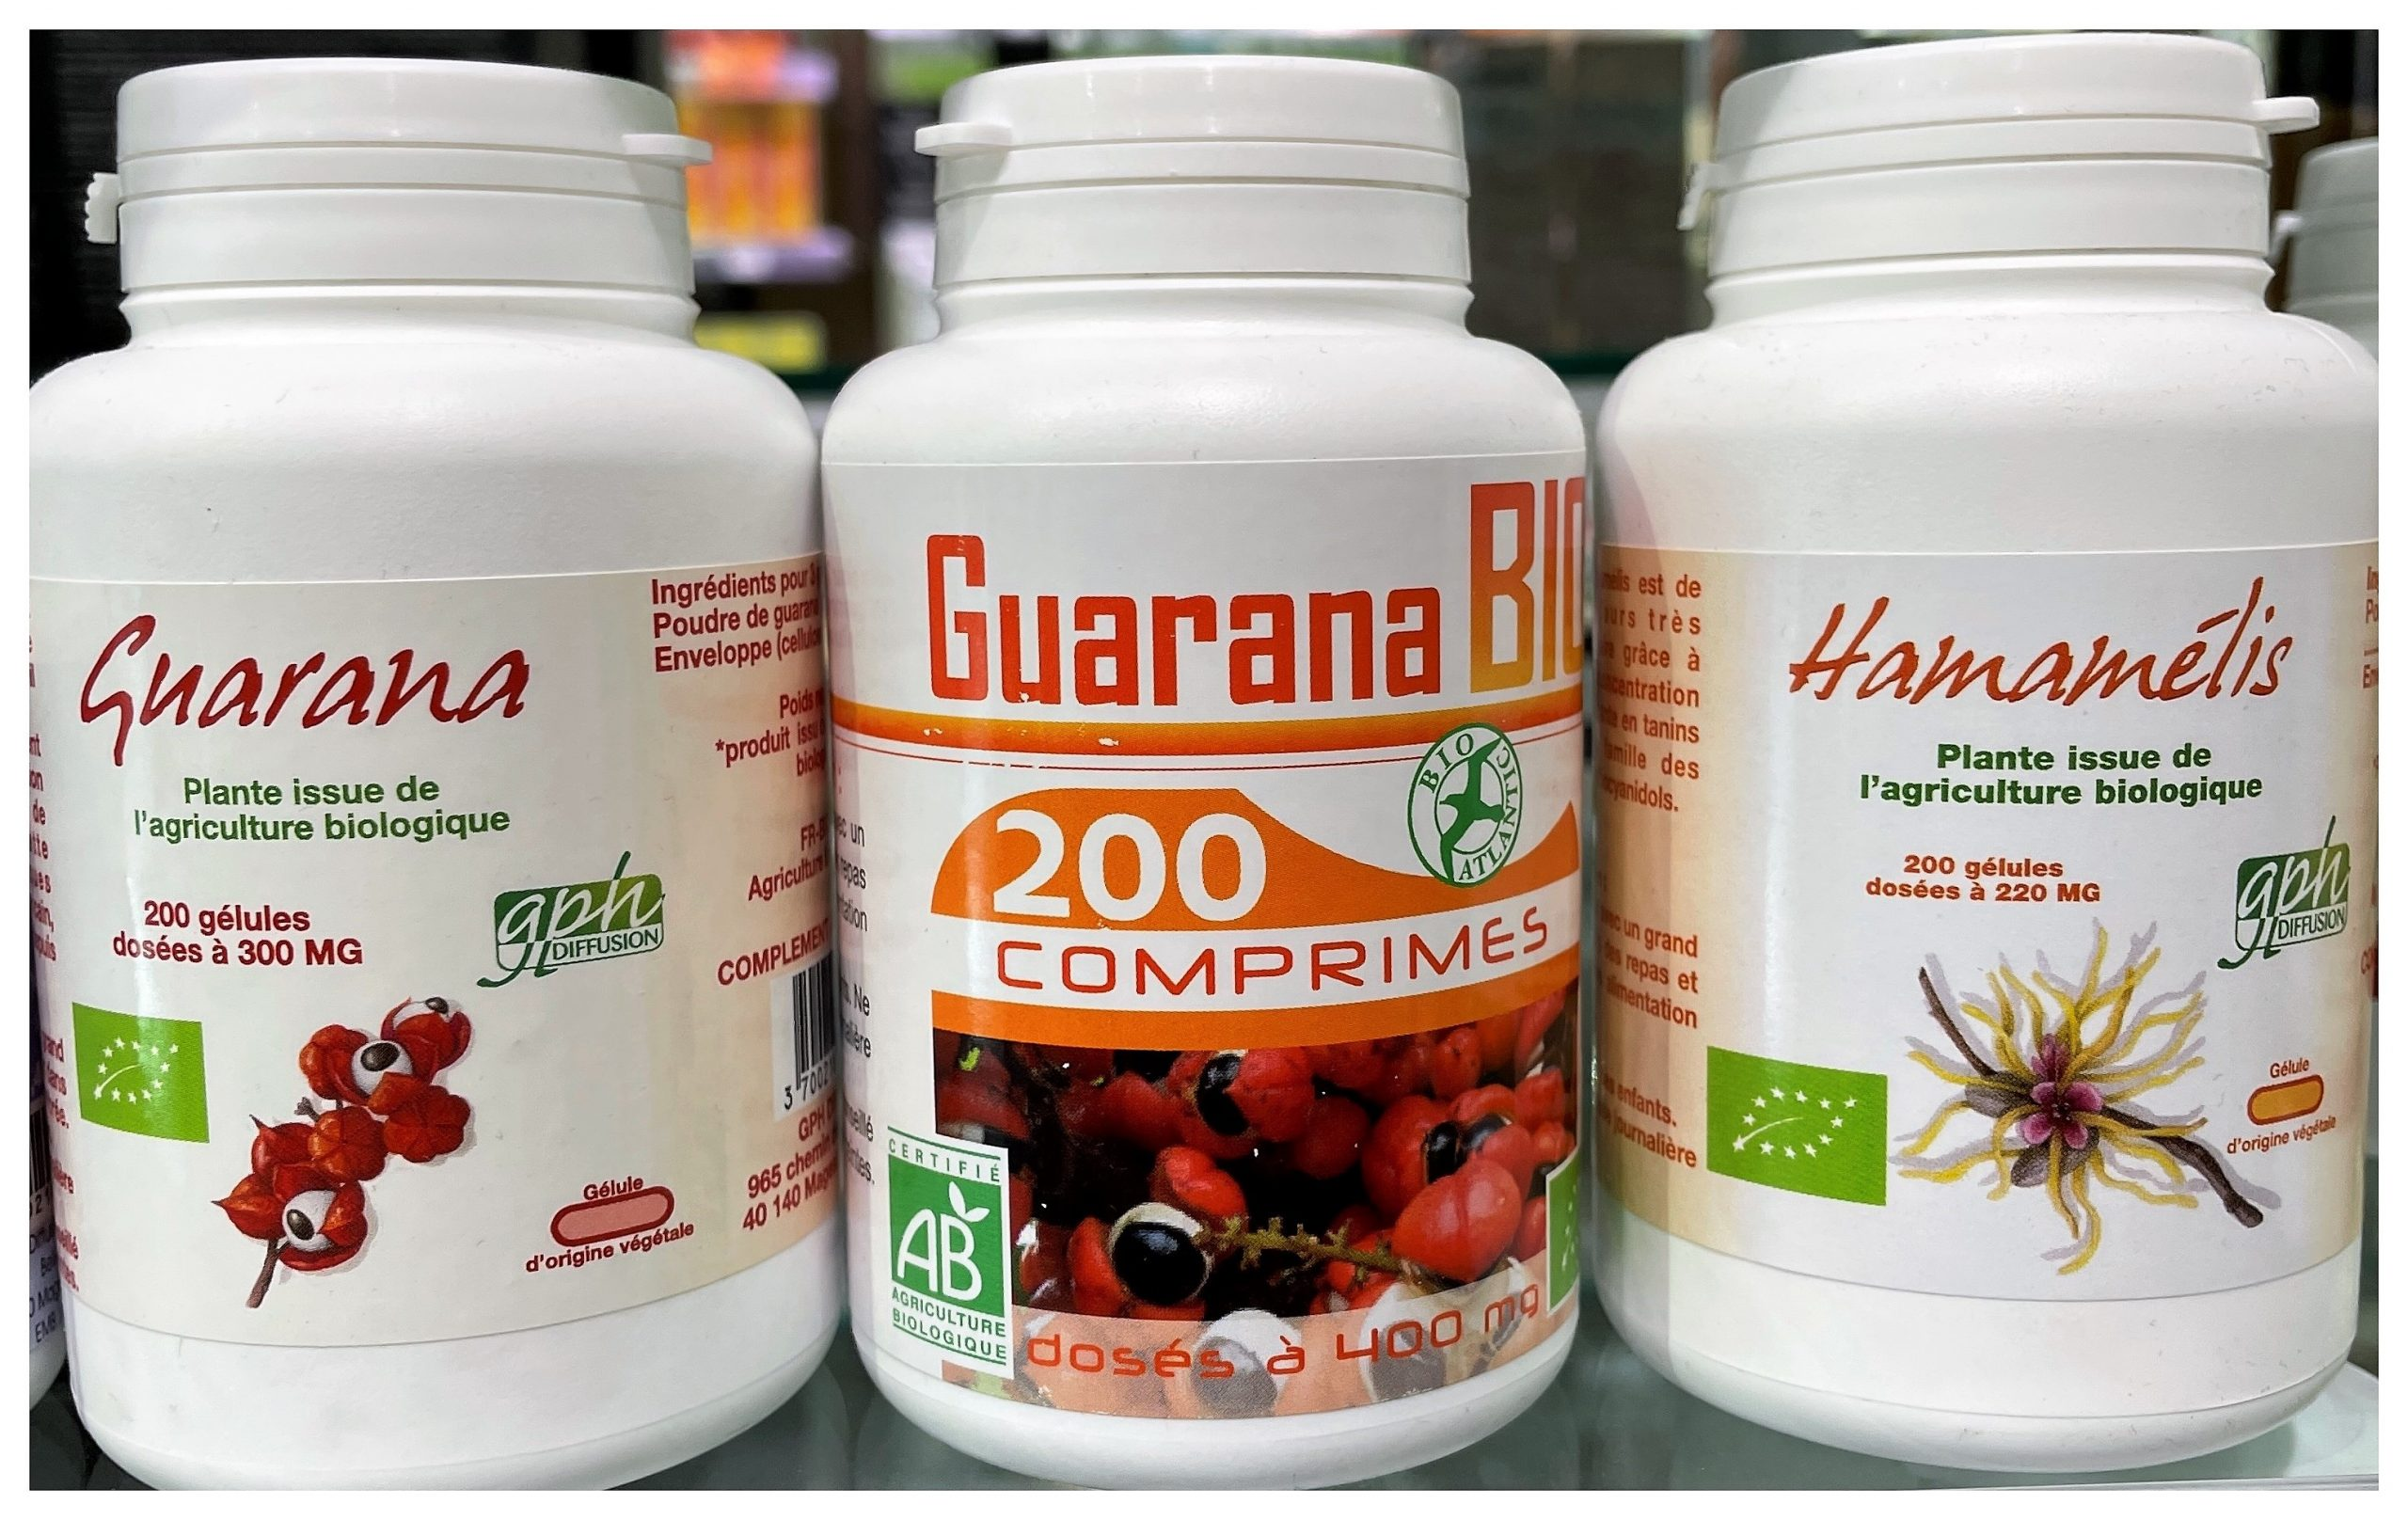 Guarana bio (Paullinia cupana) - 300 mg - 200 gélules vegétales Produit issu de l'agriculture biologiqueX